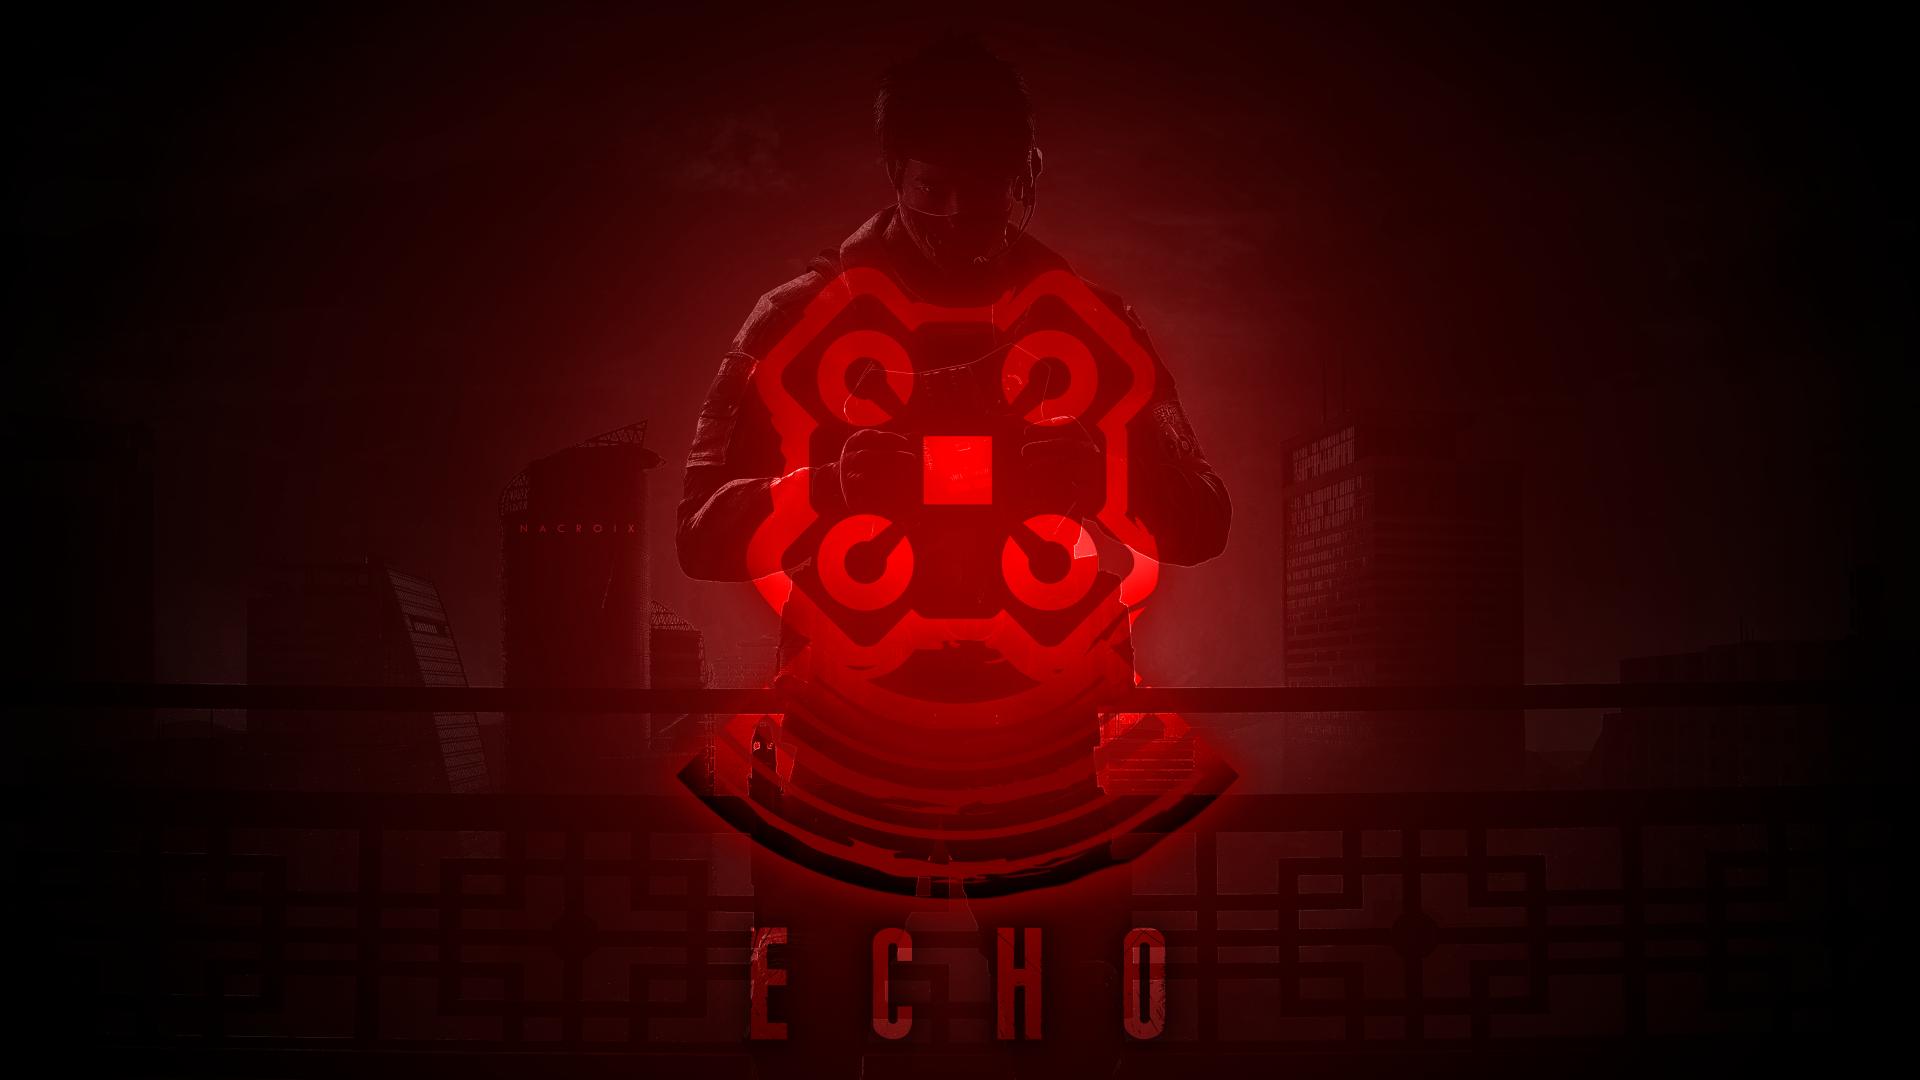 Echo 8k Ultra Hd Wallpaper Background Image 12000x6750 Id